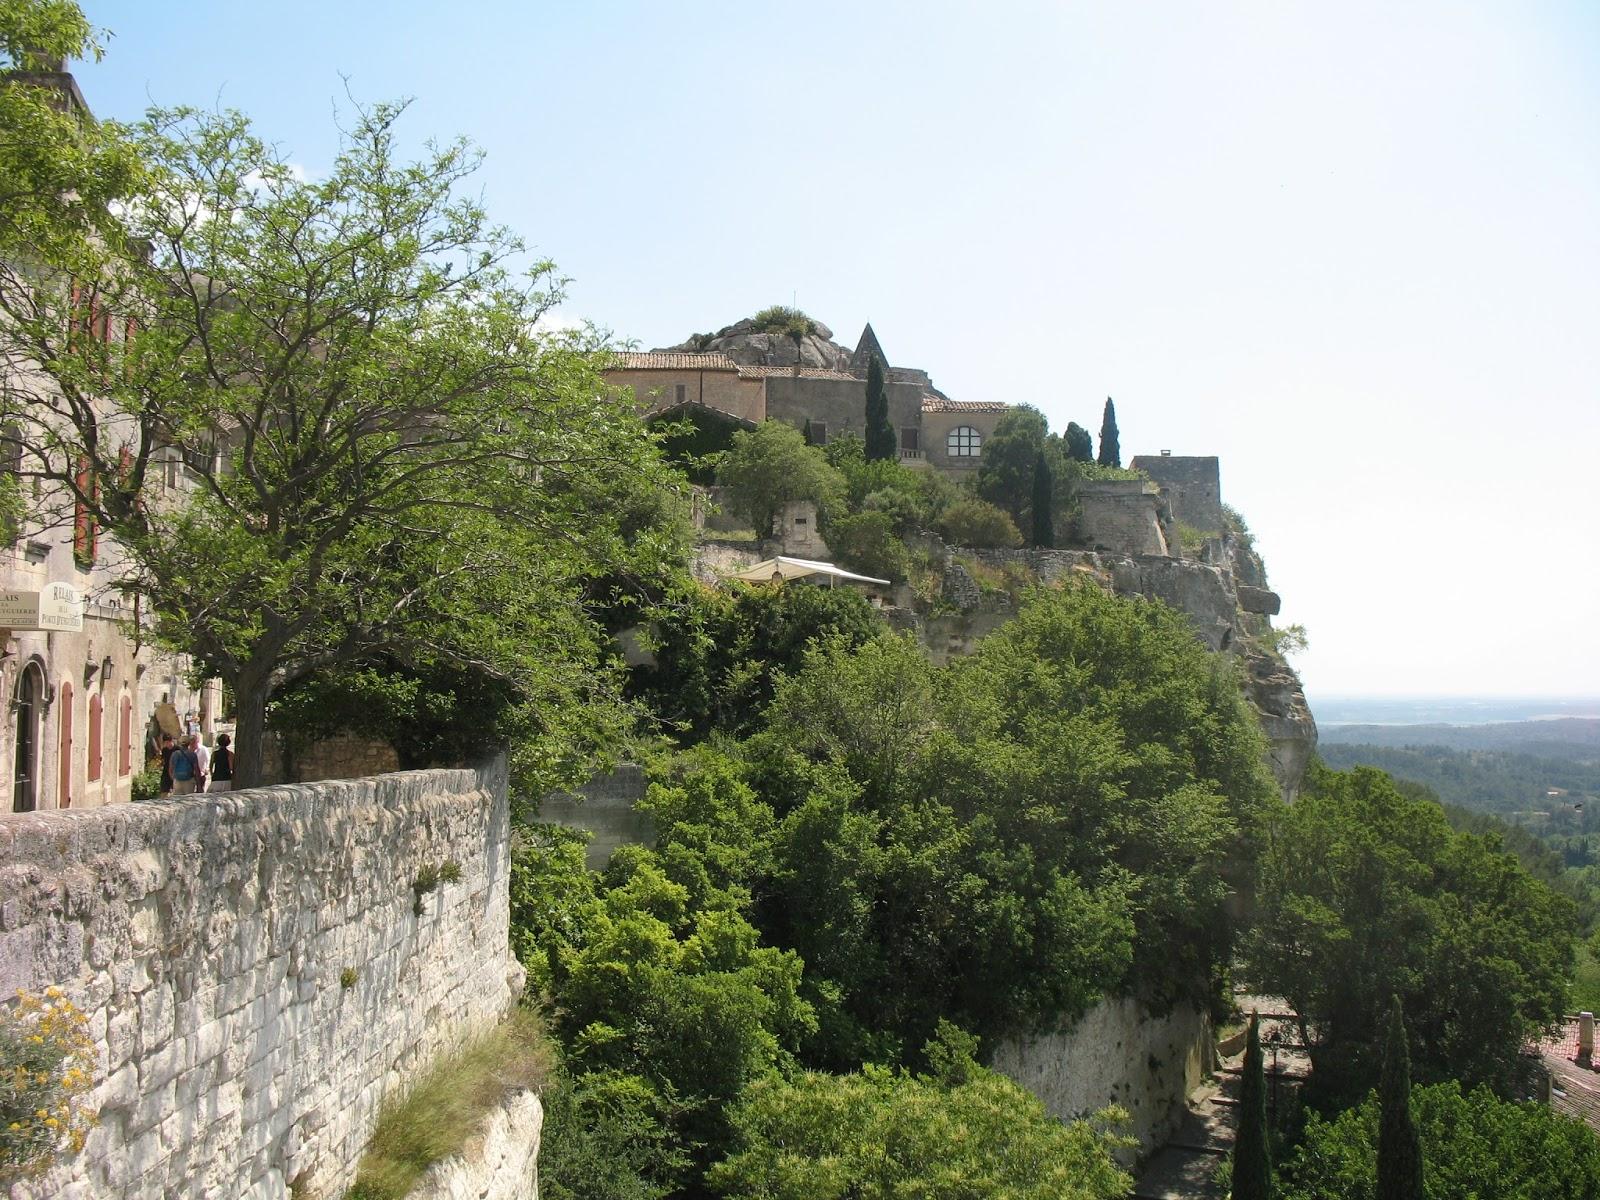 Free Intalnire Arles site- ul de dating am anuntat